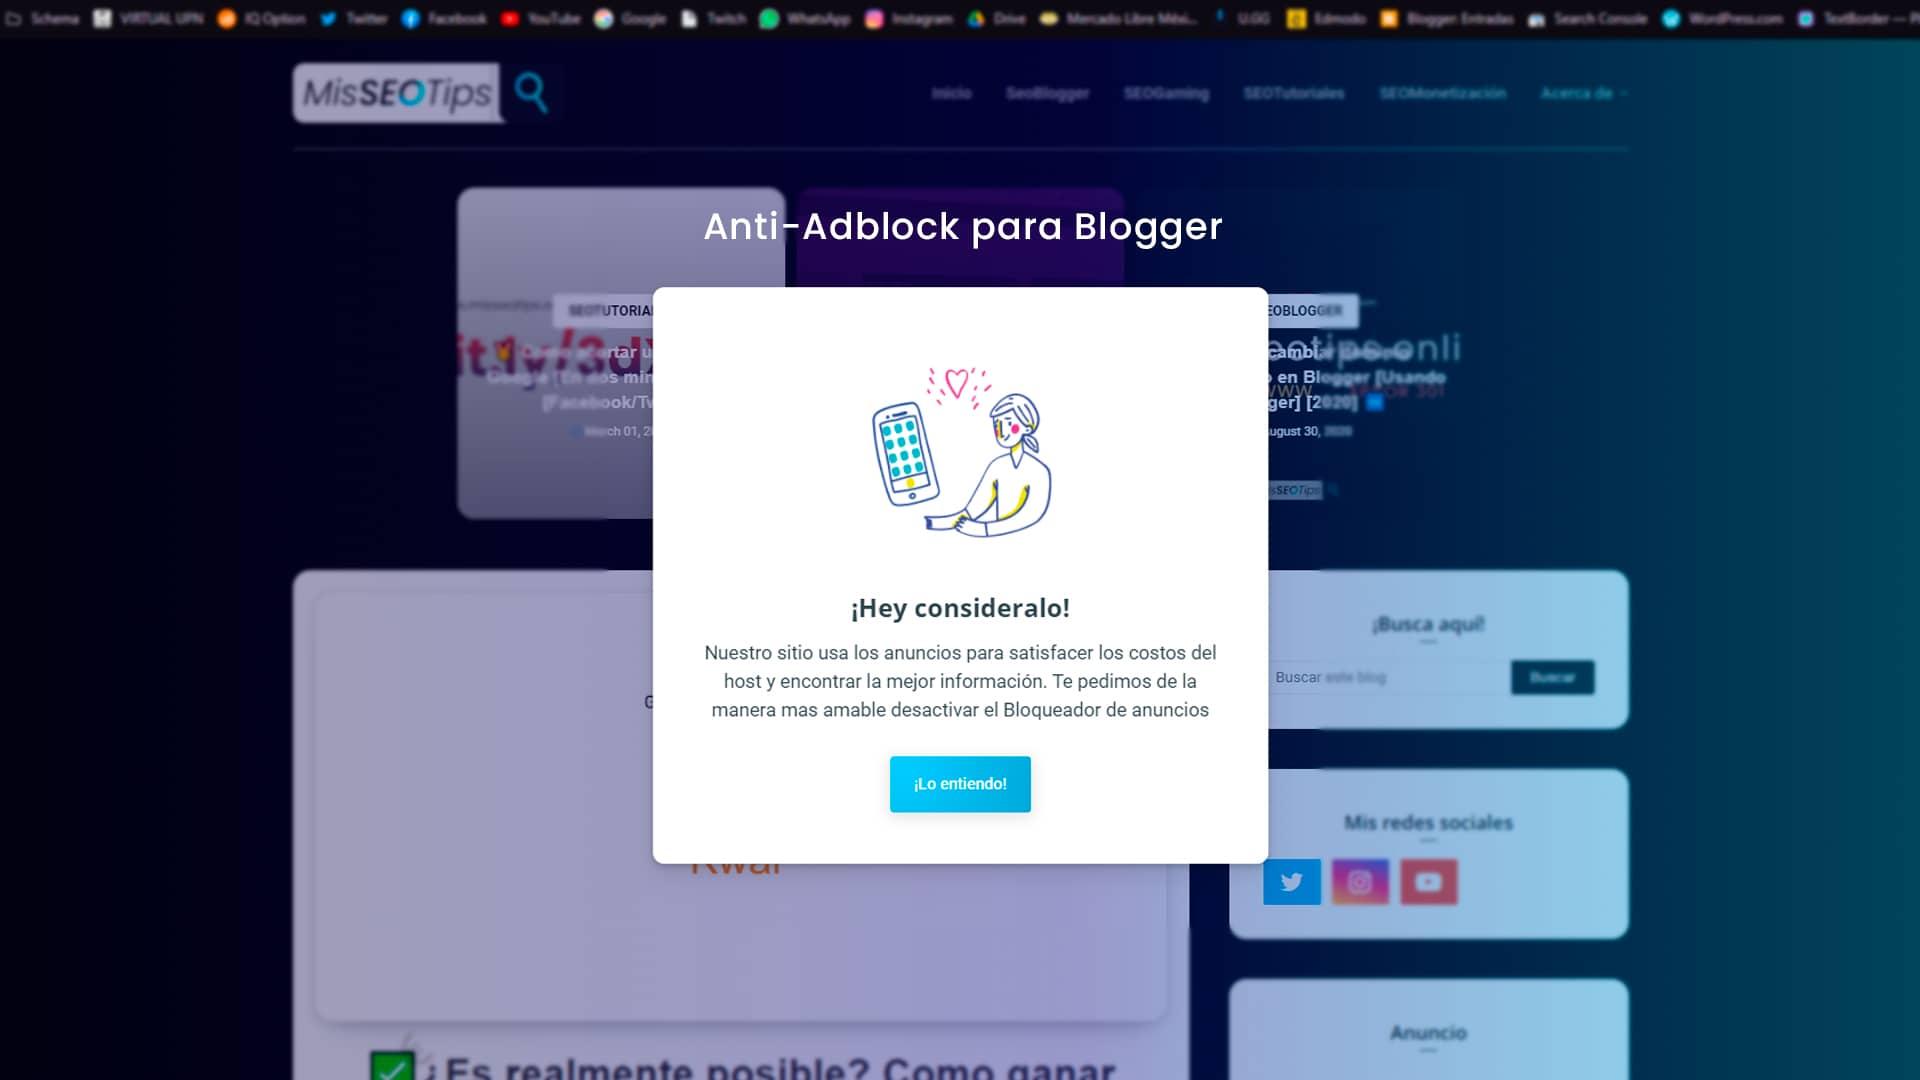 Anti-Adblock para Blogger gratis